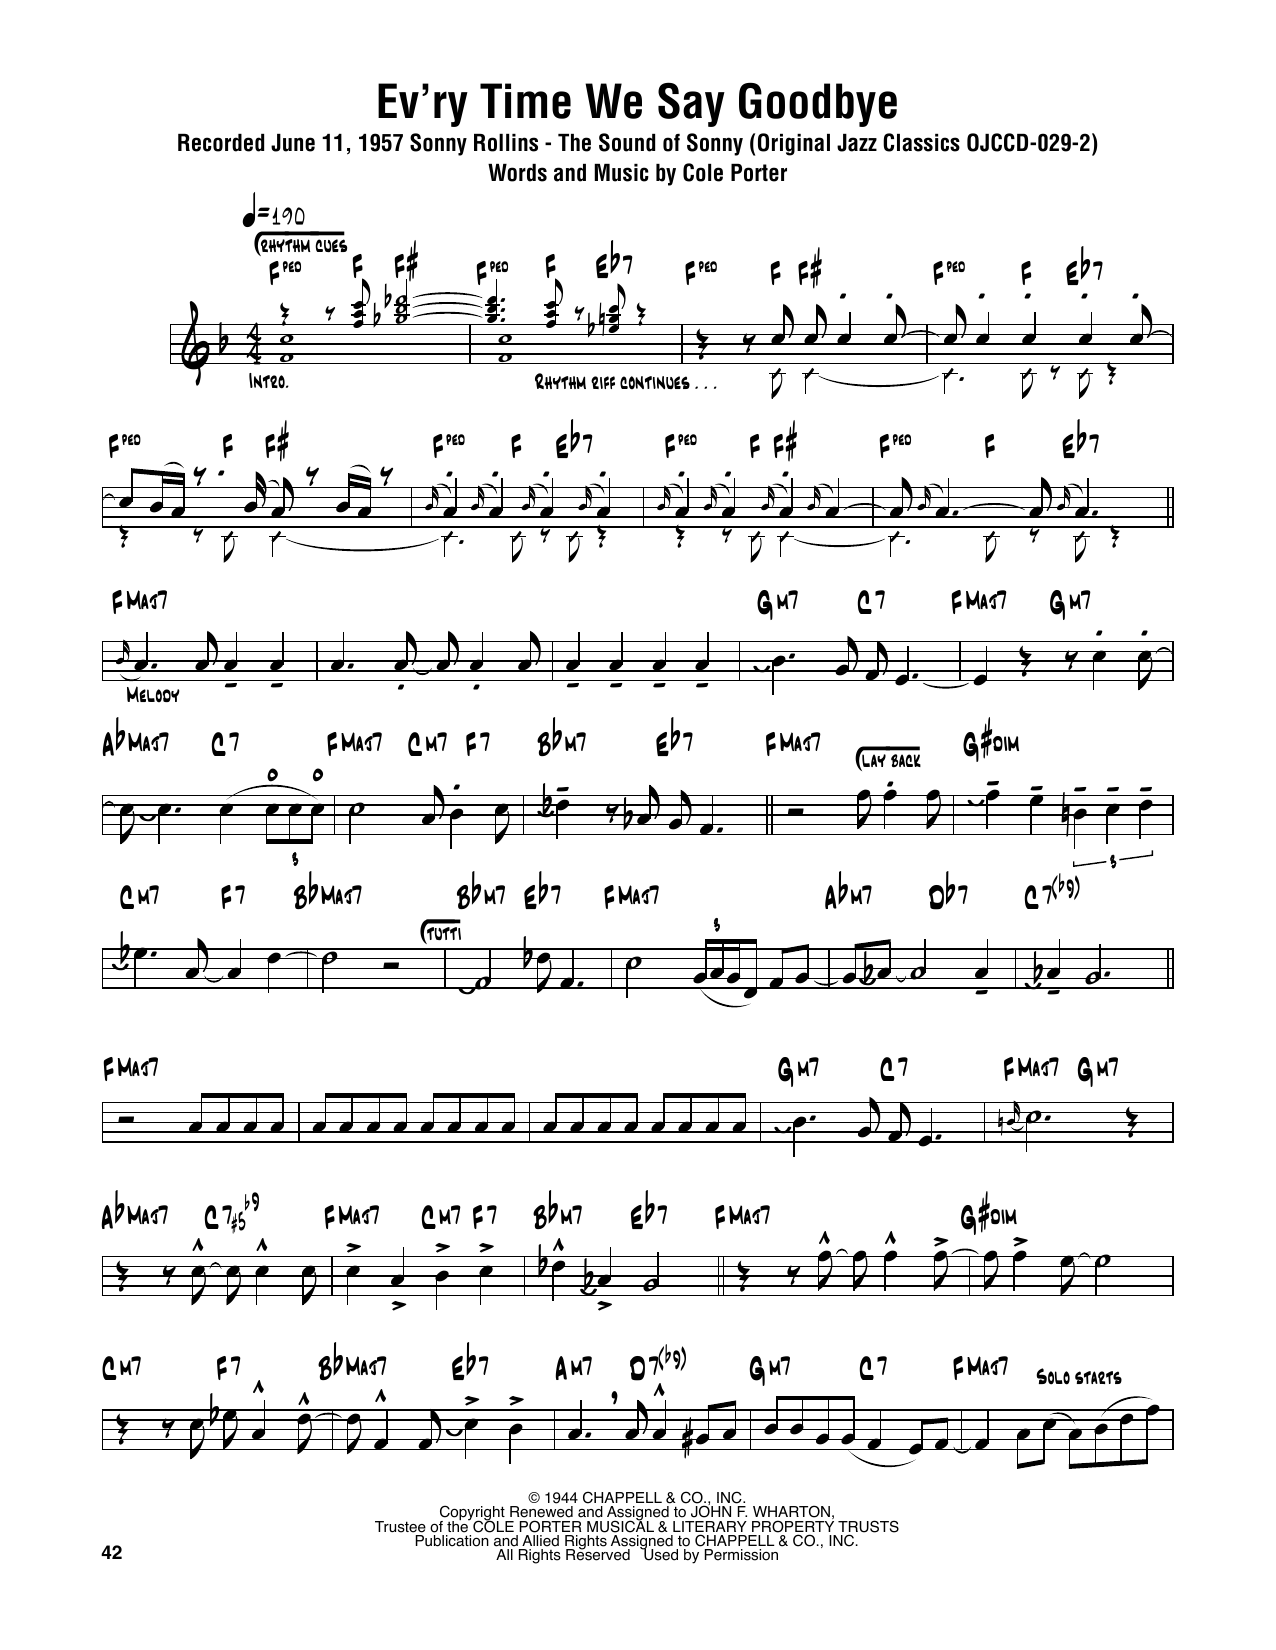 Ev'ry Time We Say Goodbye (Tenor Sax Transcription)